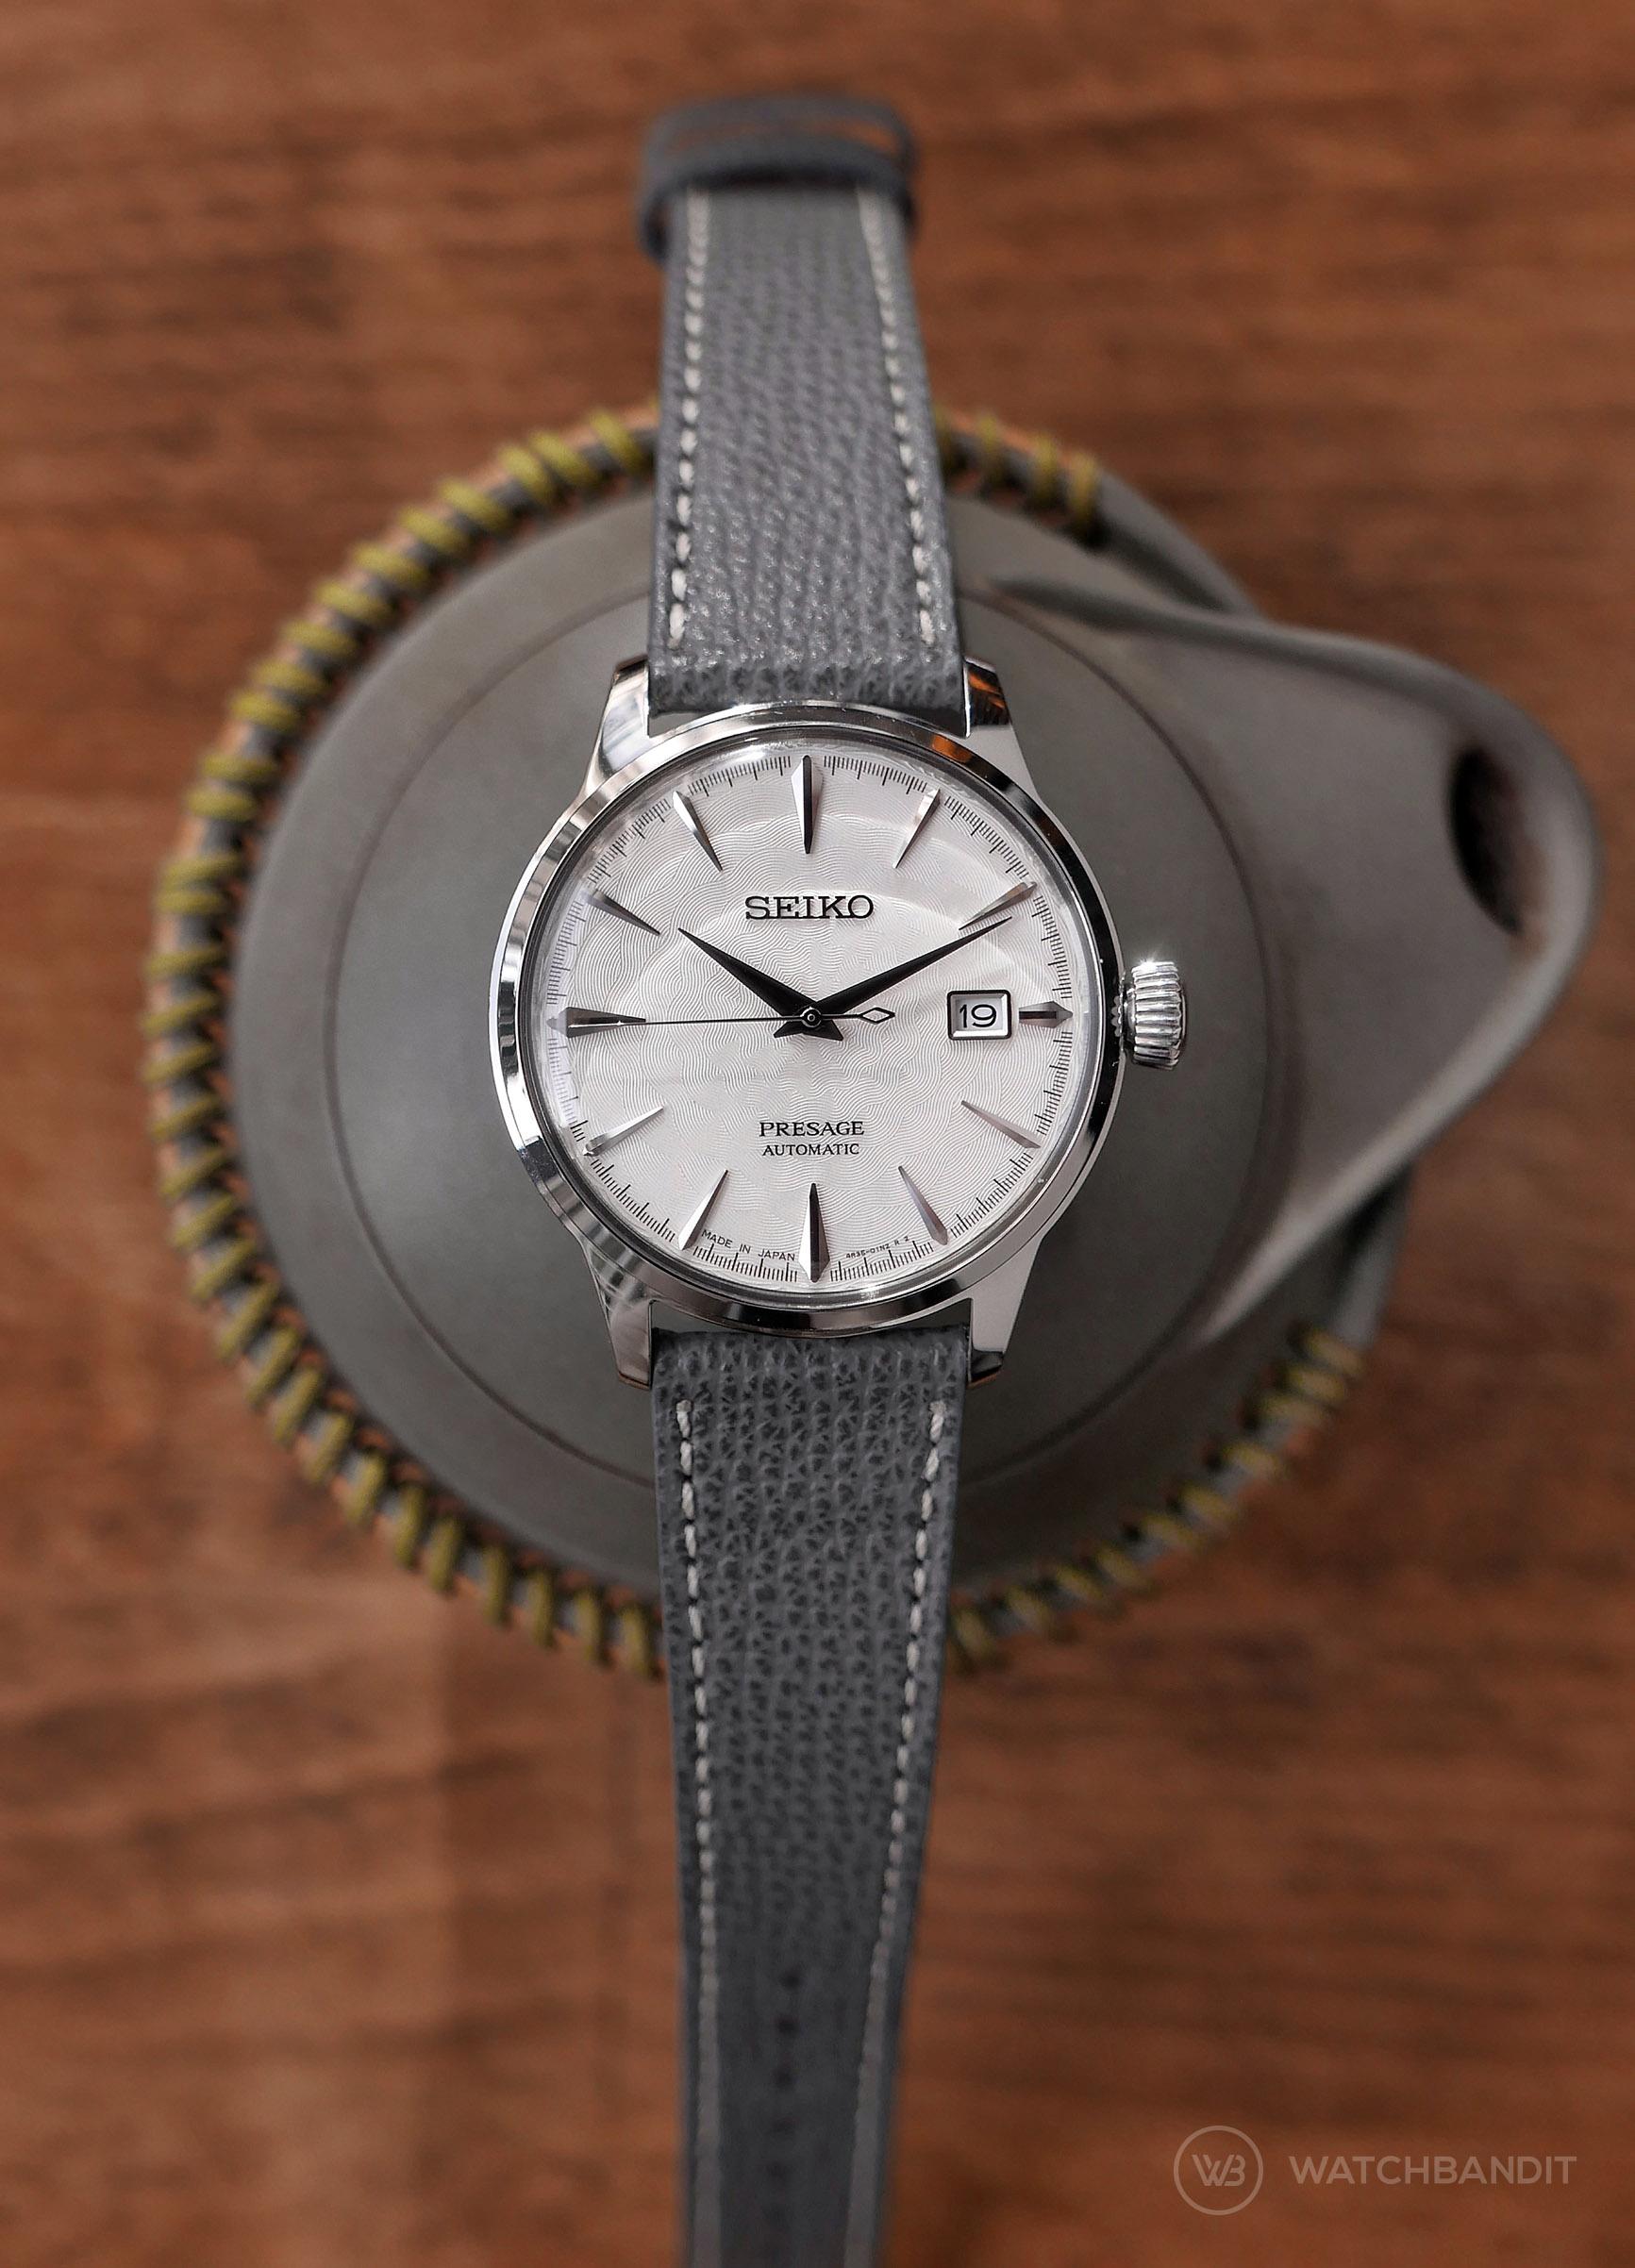 Name:  Seiko Presage grey textured calfskin leather strap Watchbandit.jpg Views: 18 Size:  501.2 KB